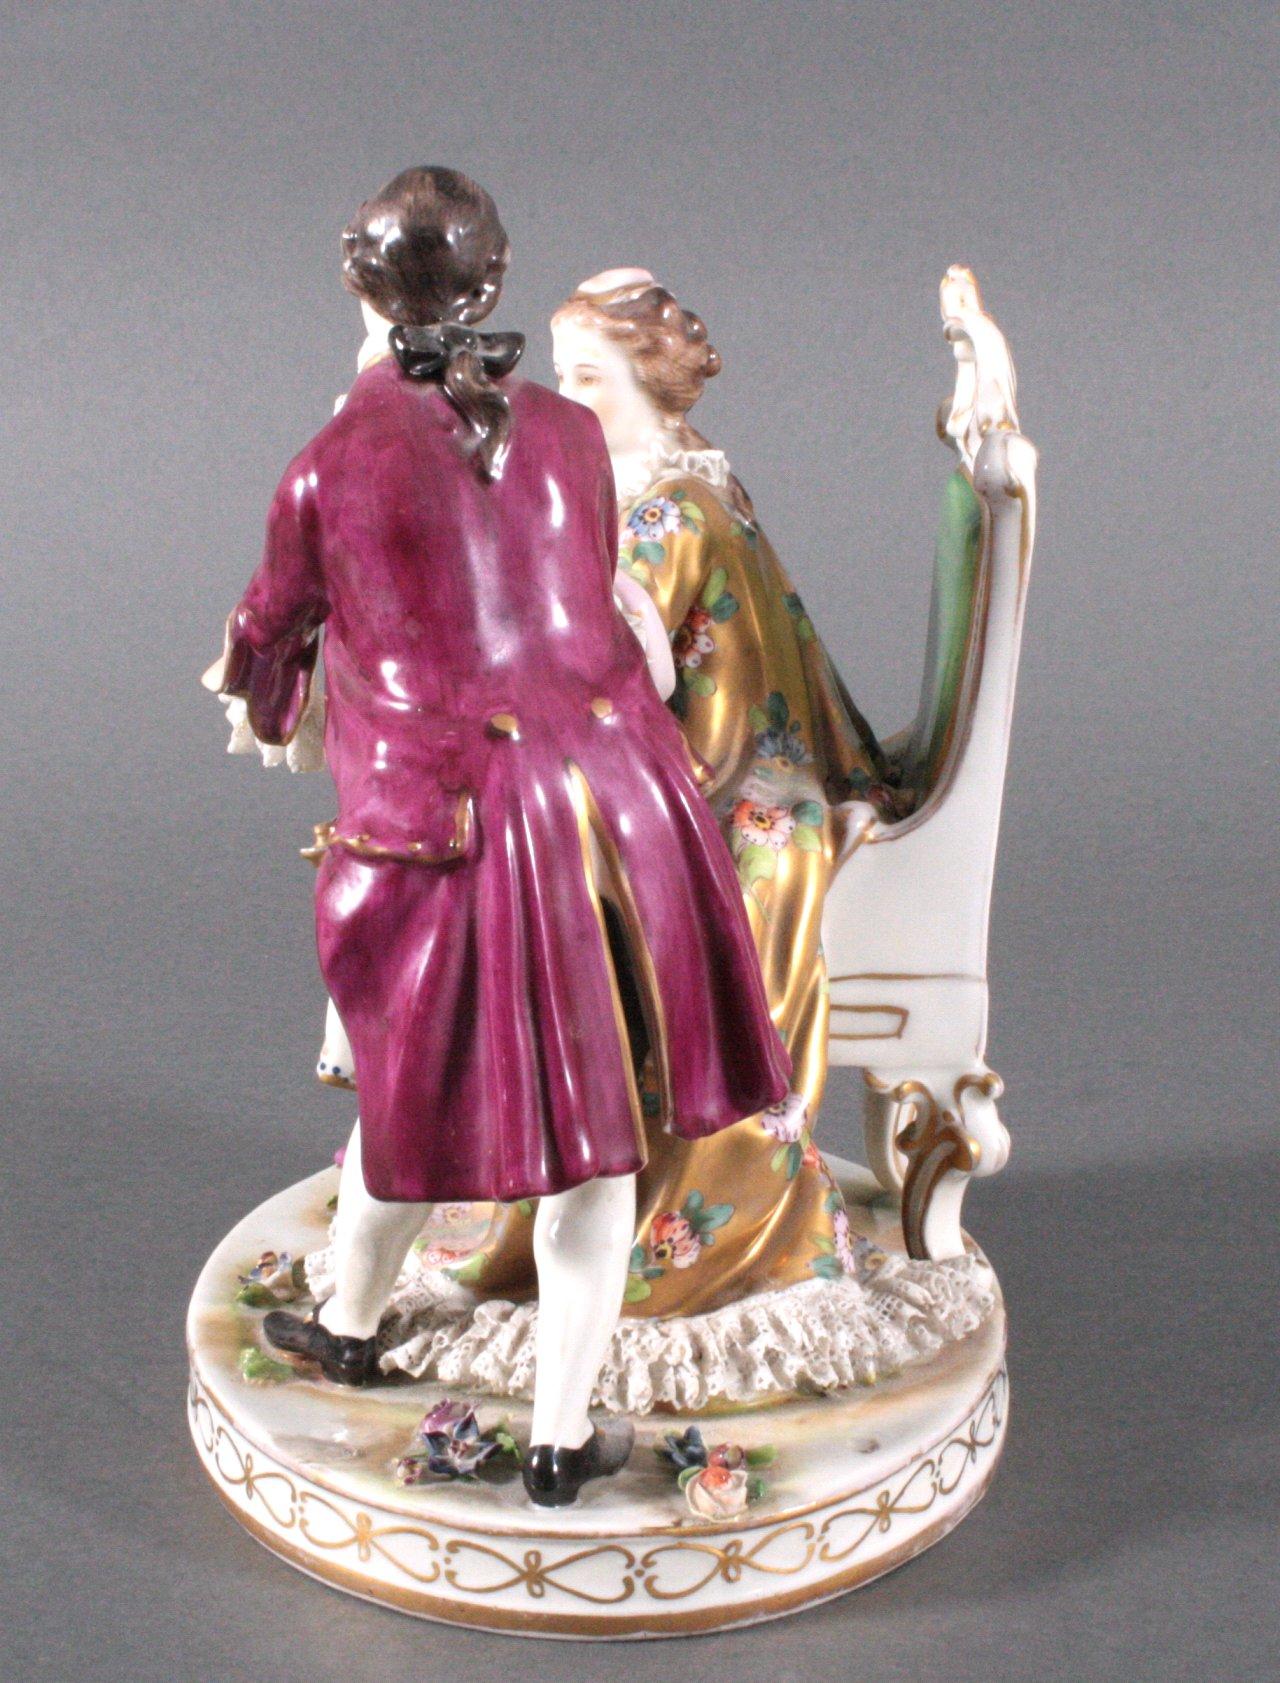 Porzellan-Skulptur, Aelteste Vokstedter-2